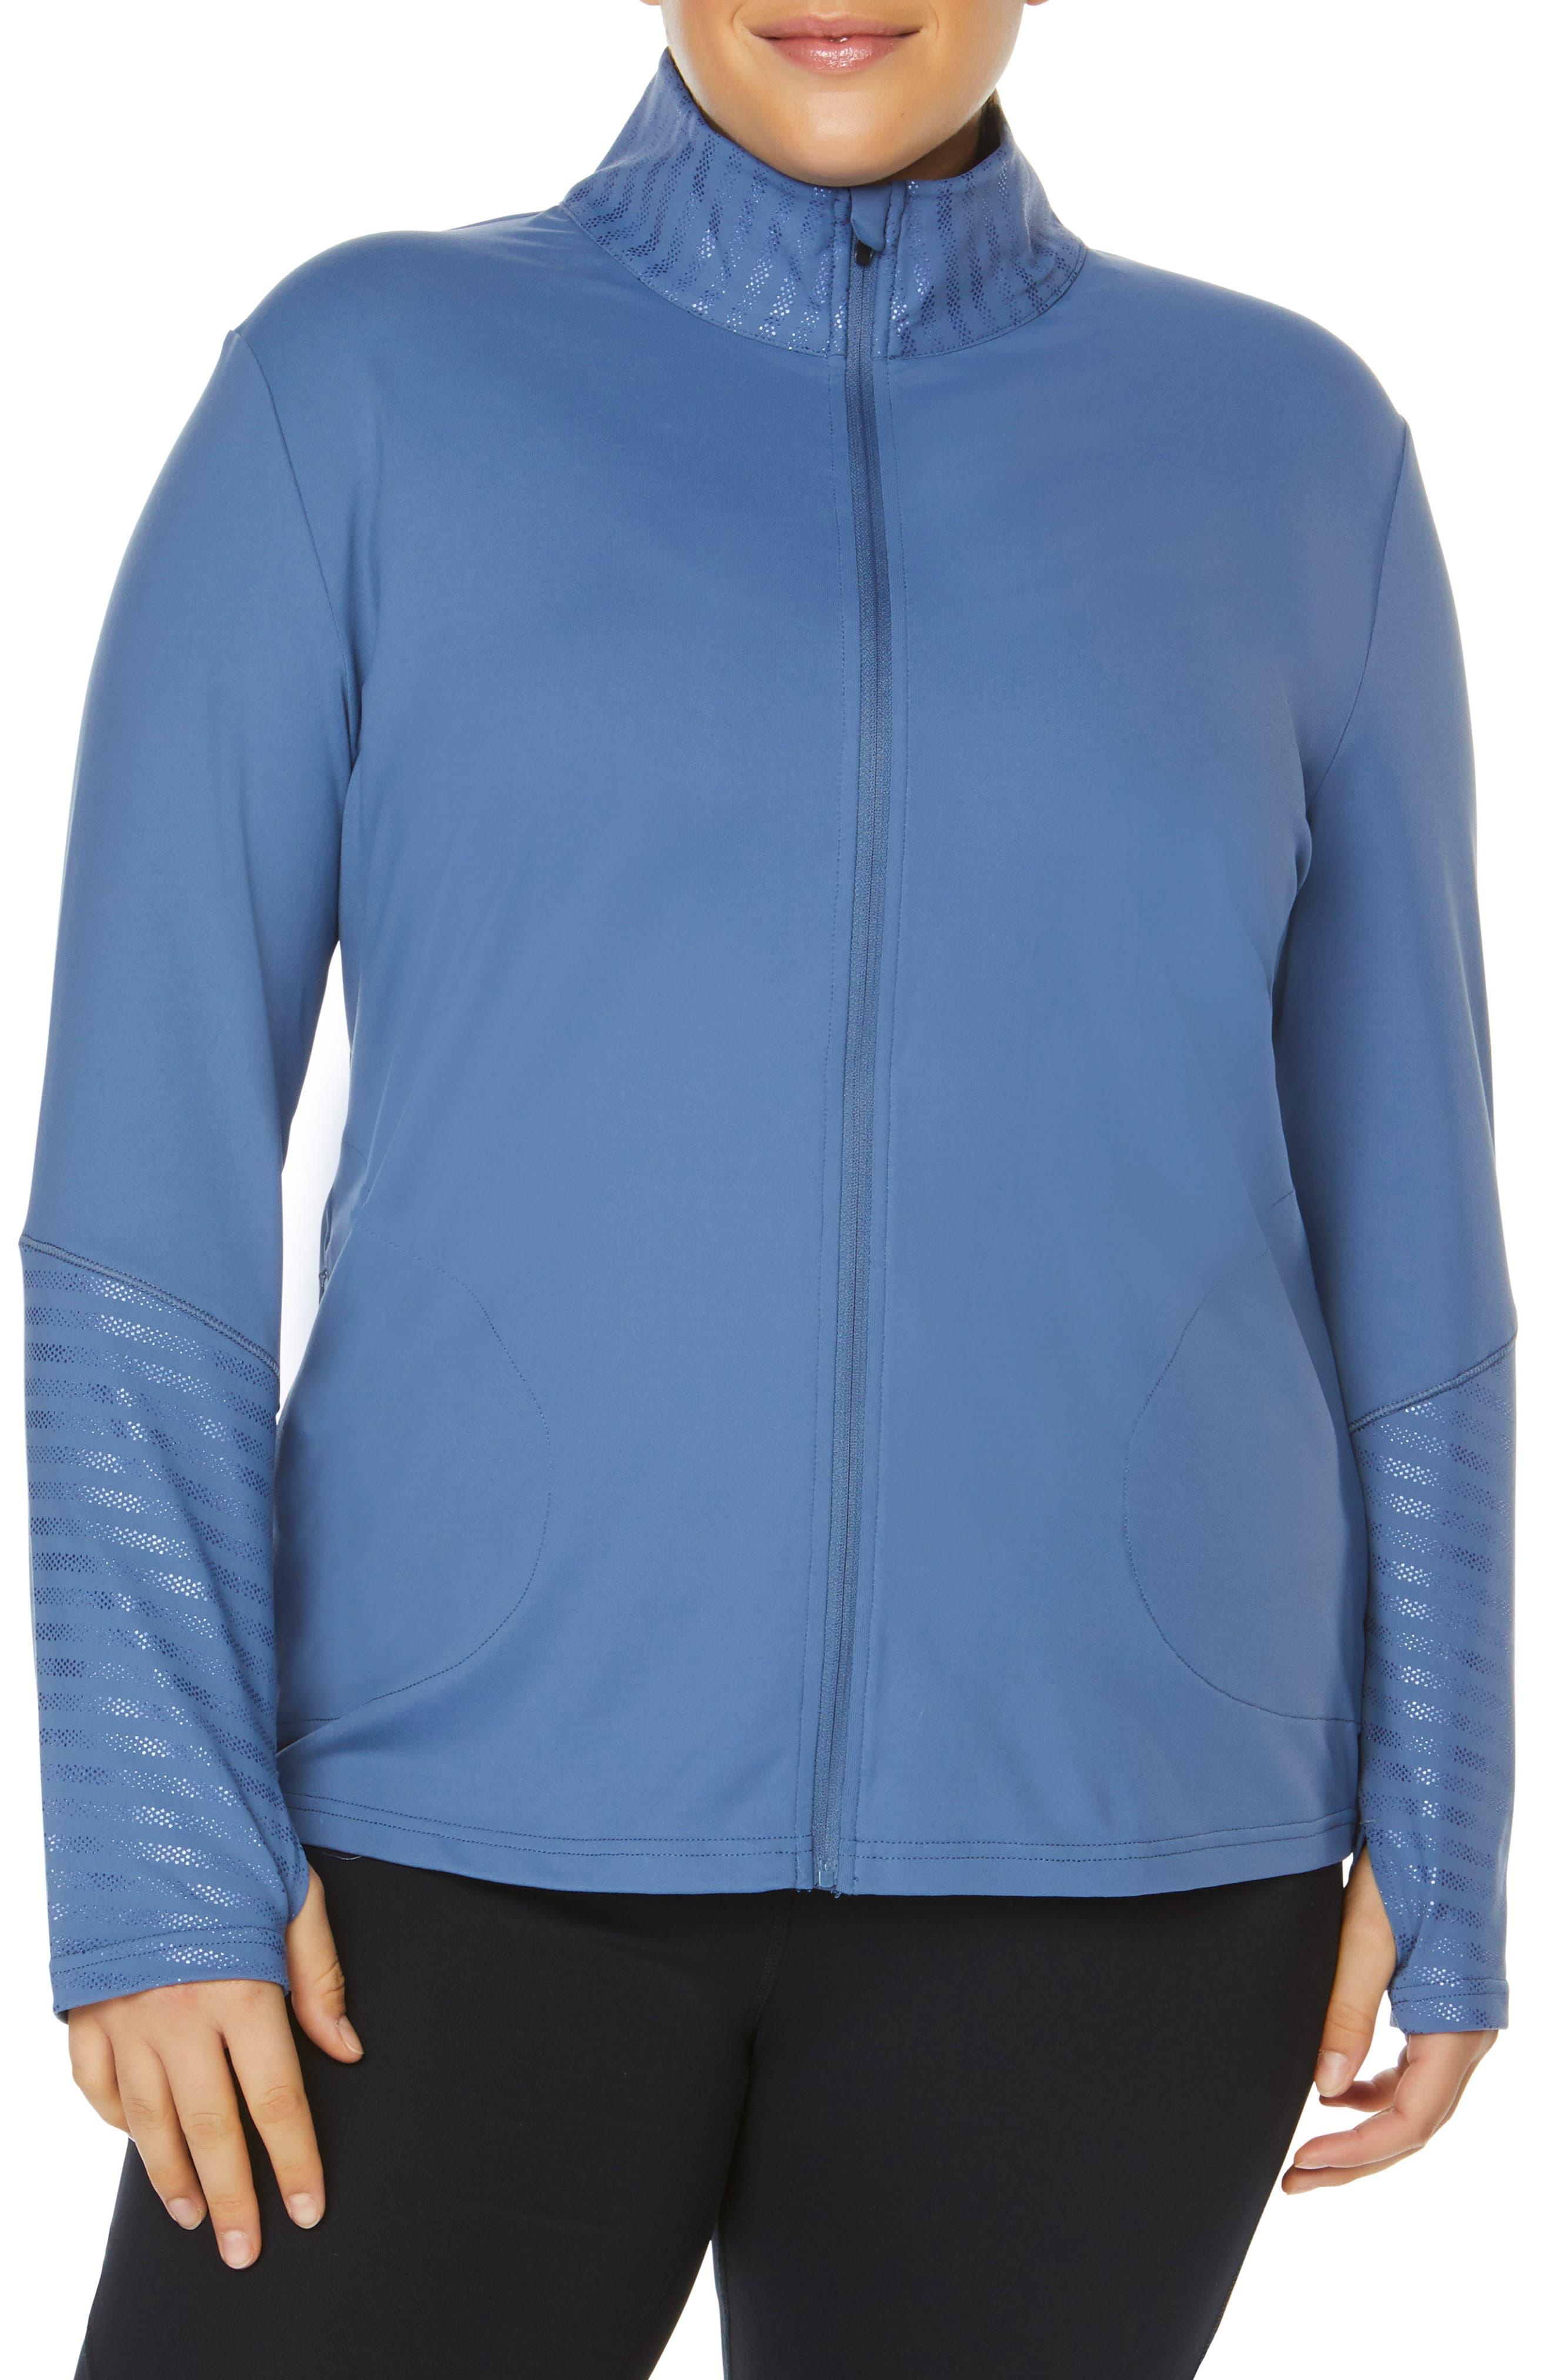 SHAPE ACTIVEWEAR Refine Jacket, Main, color, 057